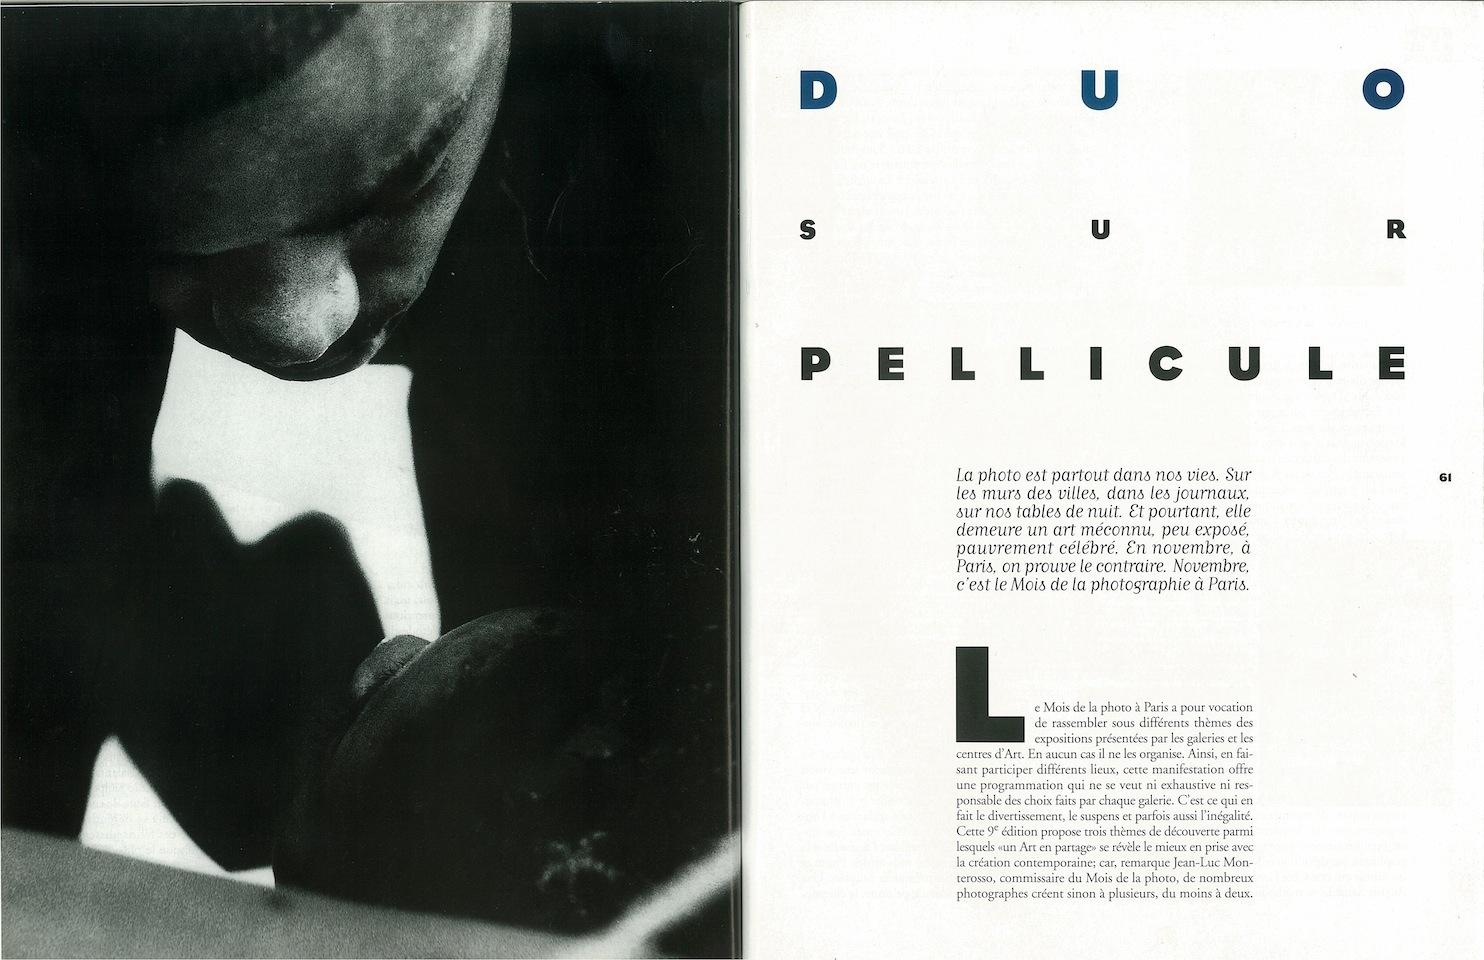 duo_sur_pellicule-1